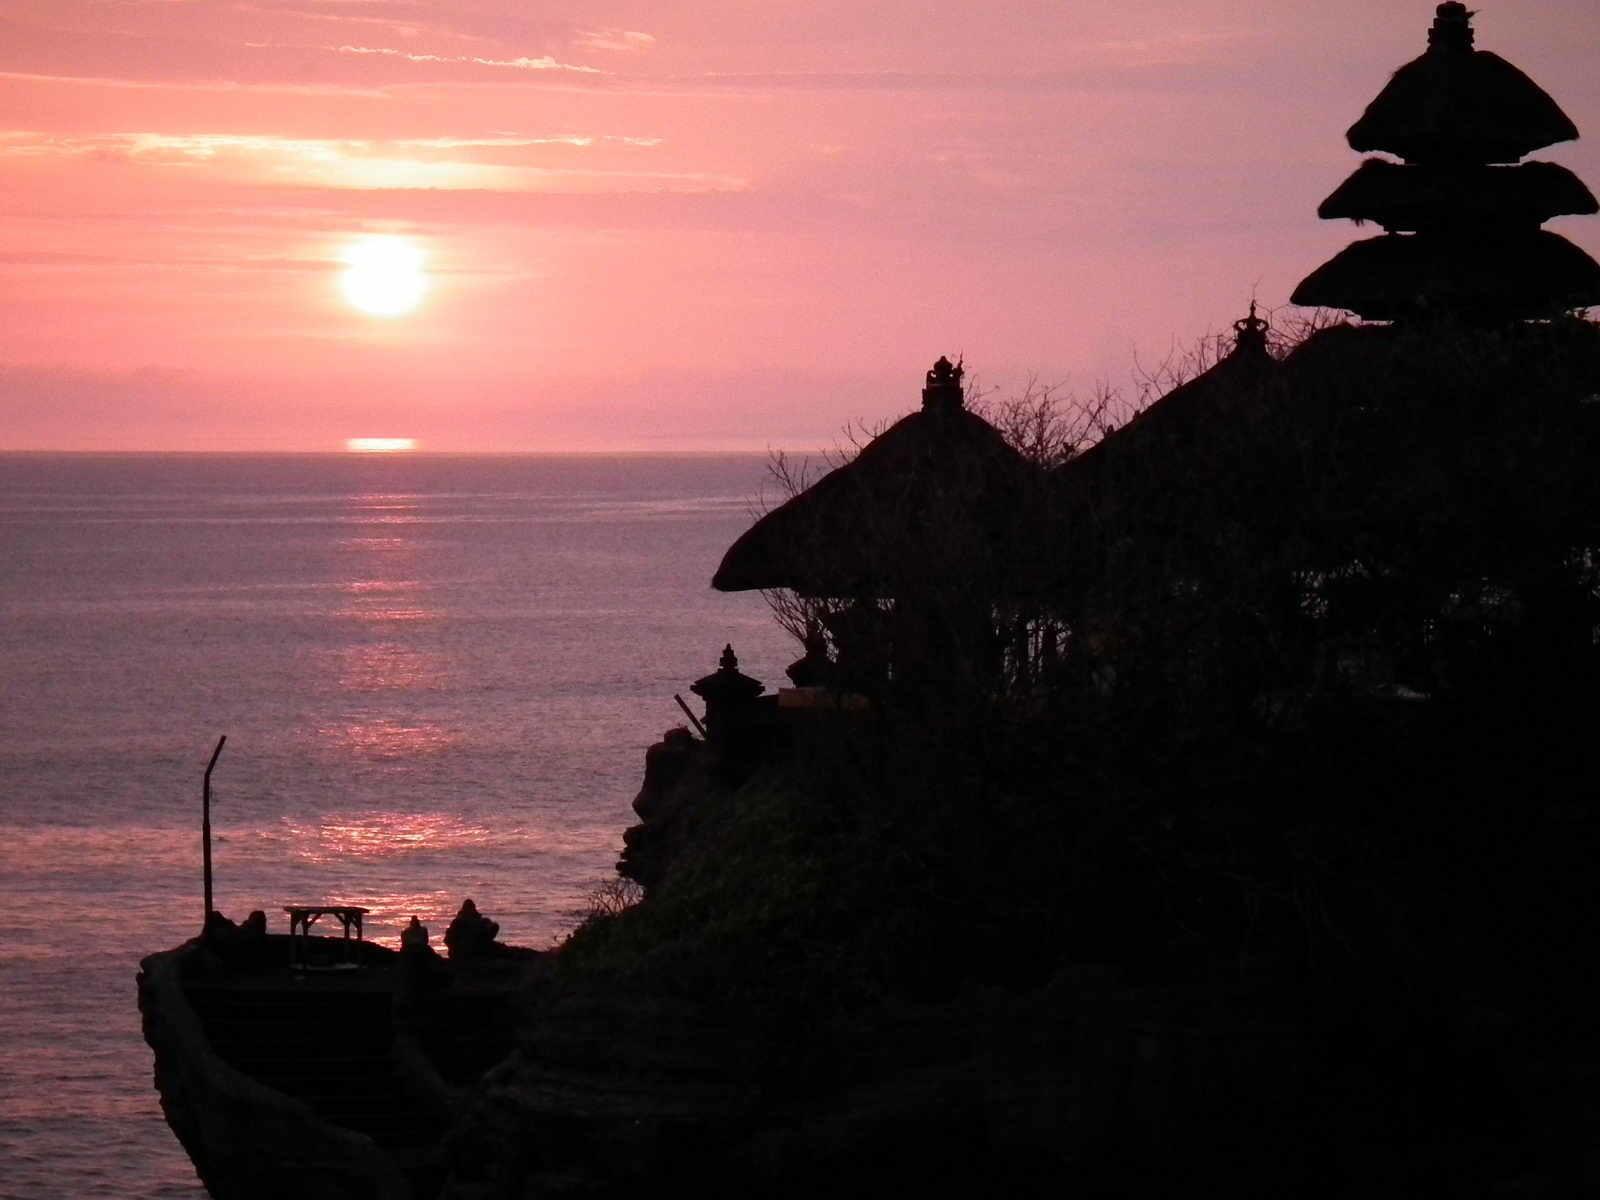 Nyepi Day - Silence Day